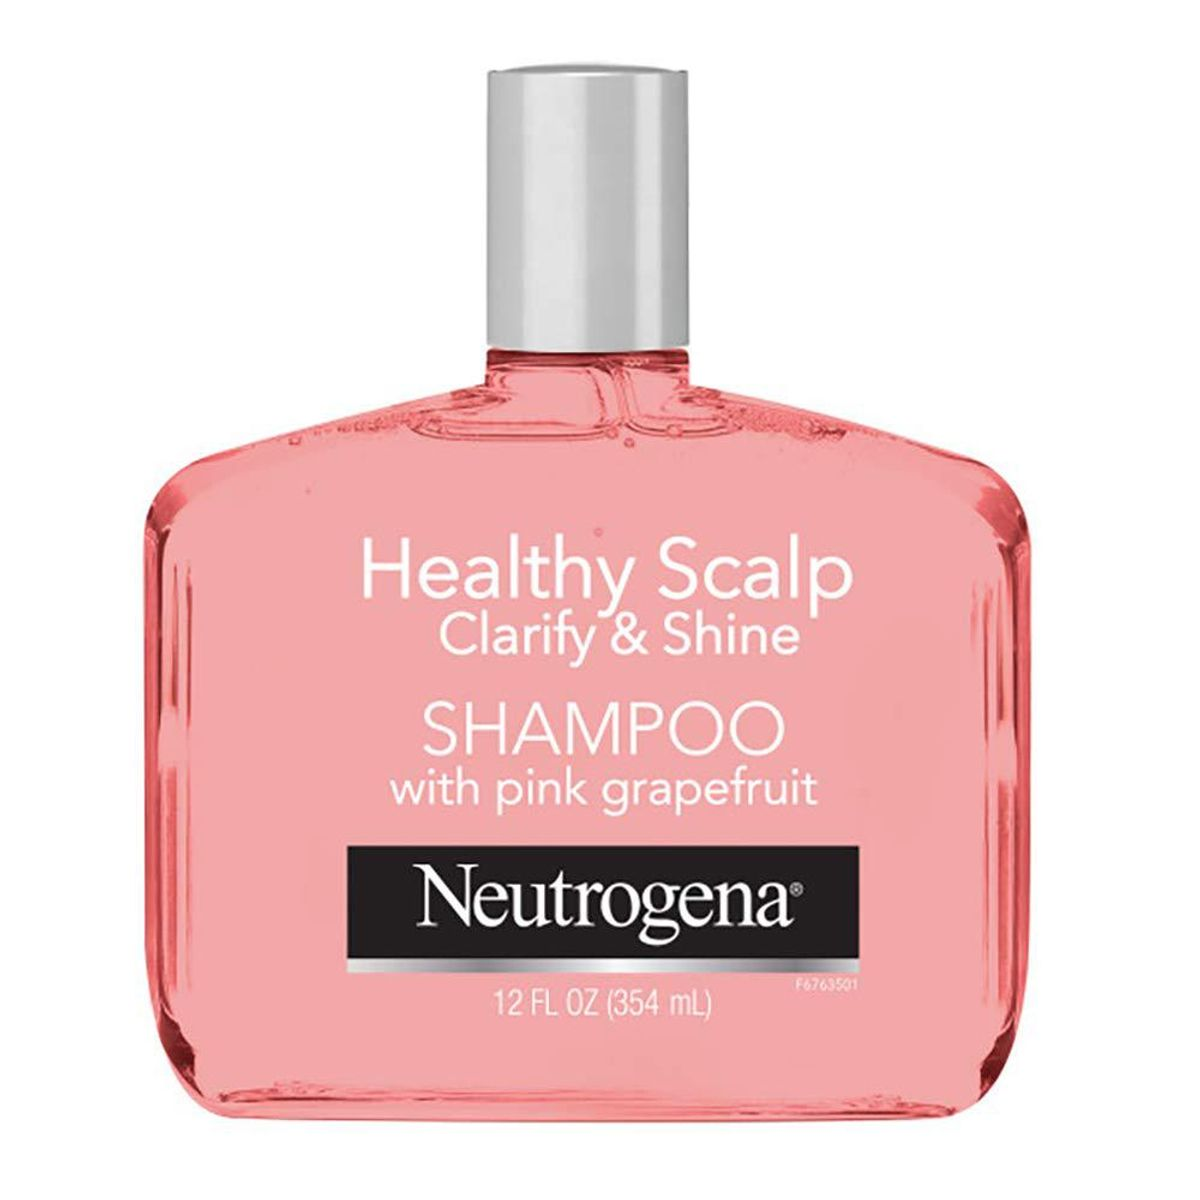 Exfoliating Shampoo for Oily Hair & Scalp